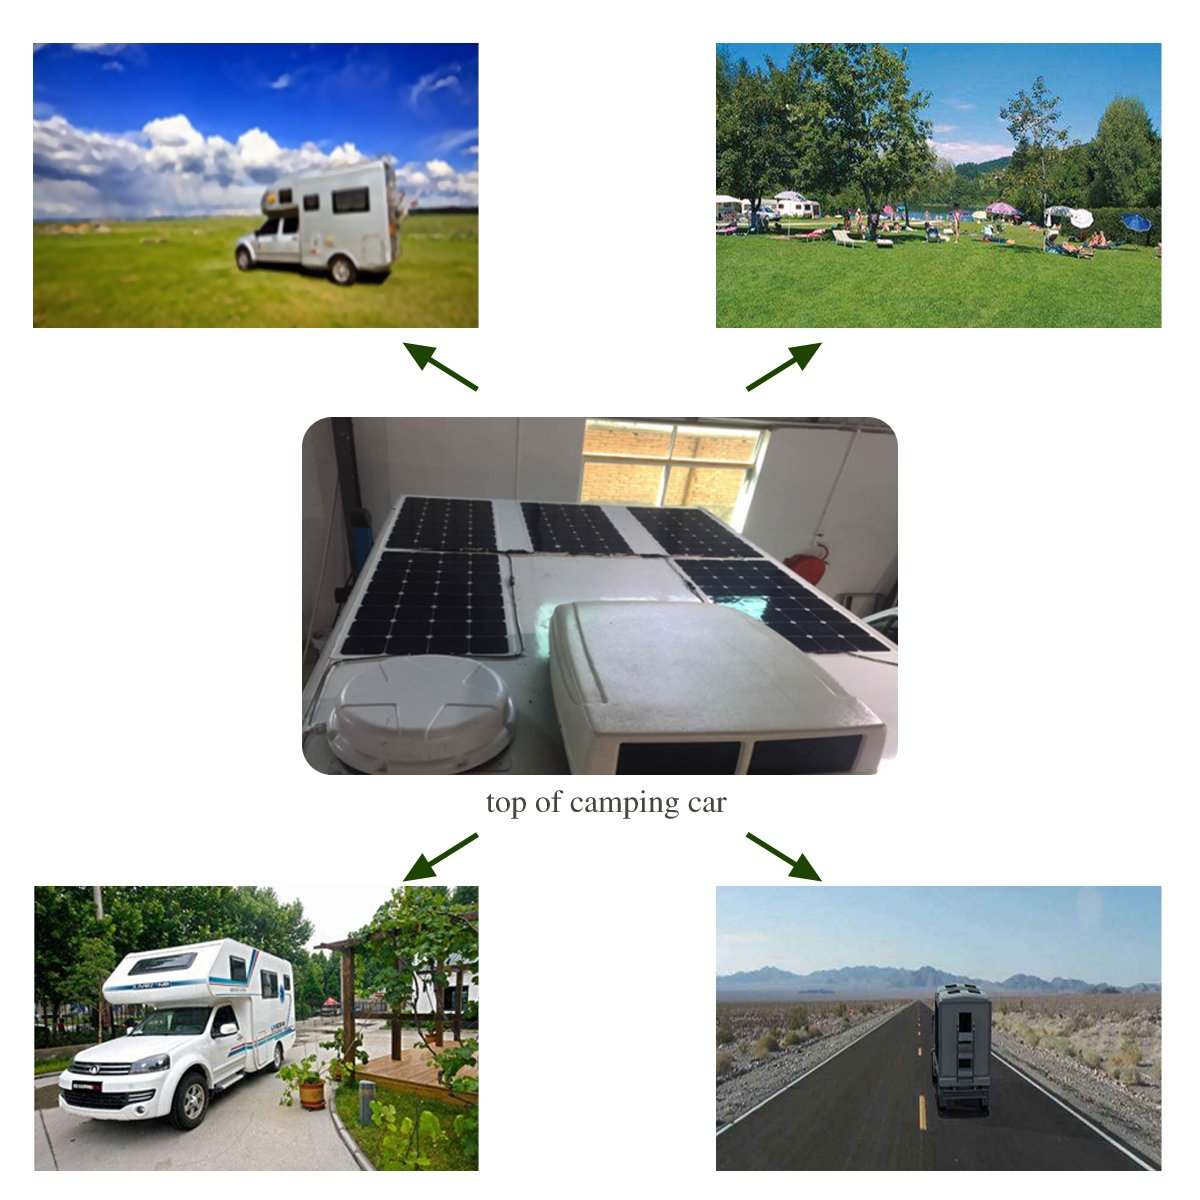 Flexible Solar Panel ,SunPower Solar Panel 100w 18V 12V ,Lightweight Flexible Solar Power Panels for RV Boat Truck Car Van Tent by Winnewsun (Image #6)